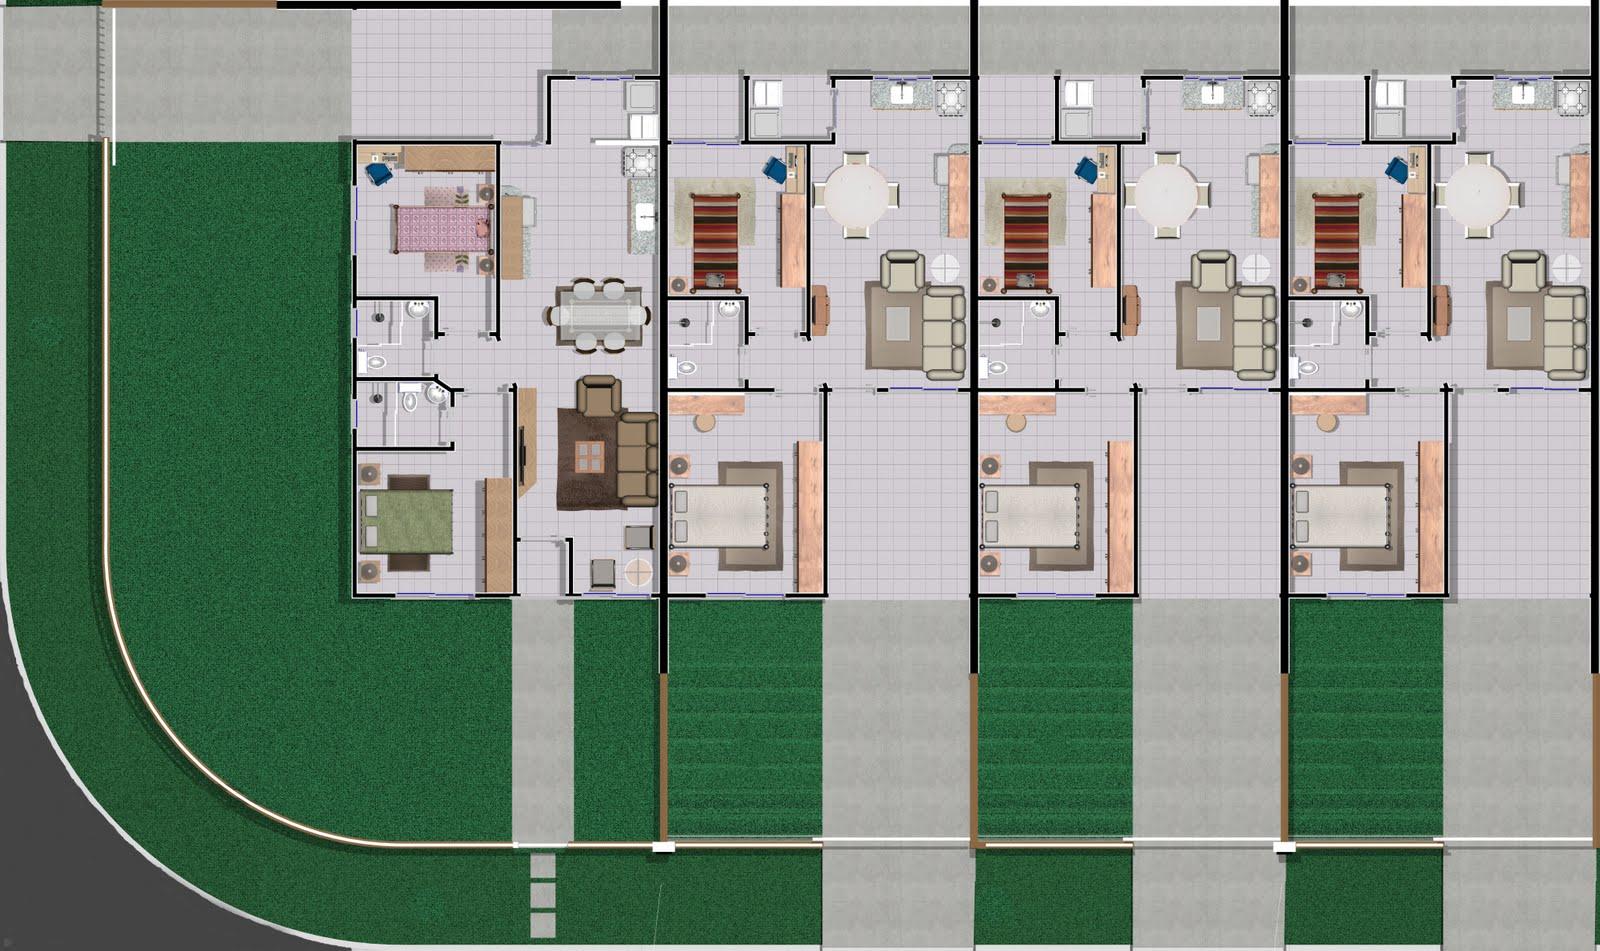 Desenhar Planta De Casa Online Pictures to pin on Pinterest #255B37 1600 951